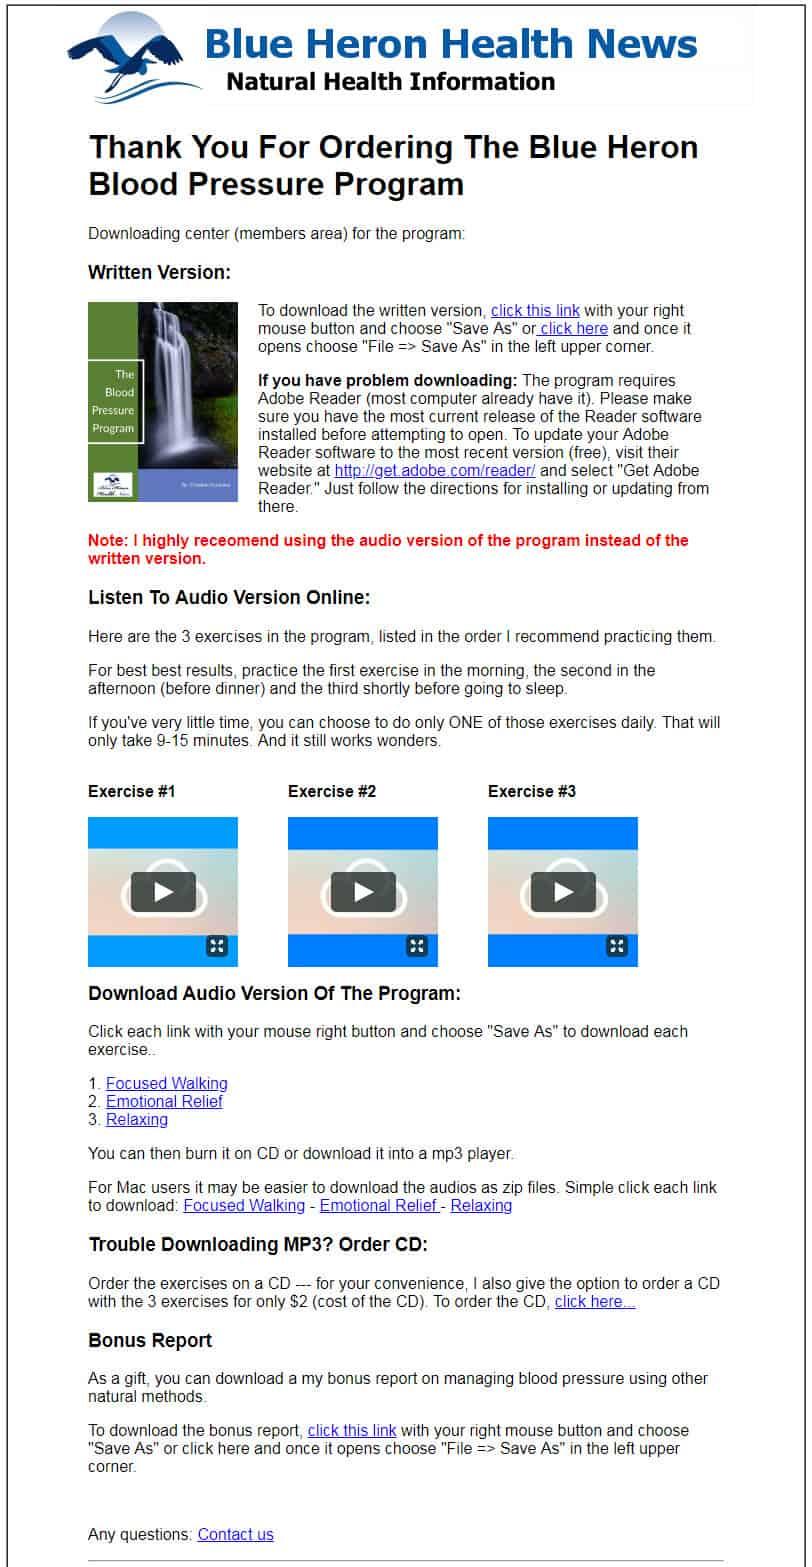 Blood Pressure Program Download Page